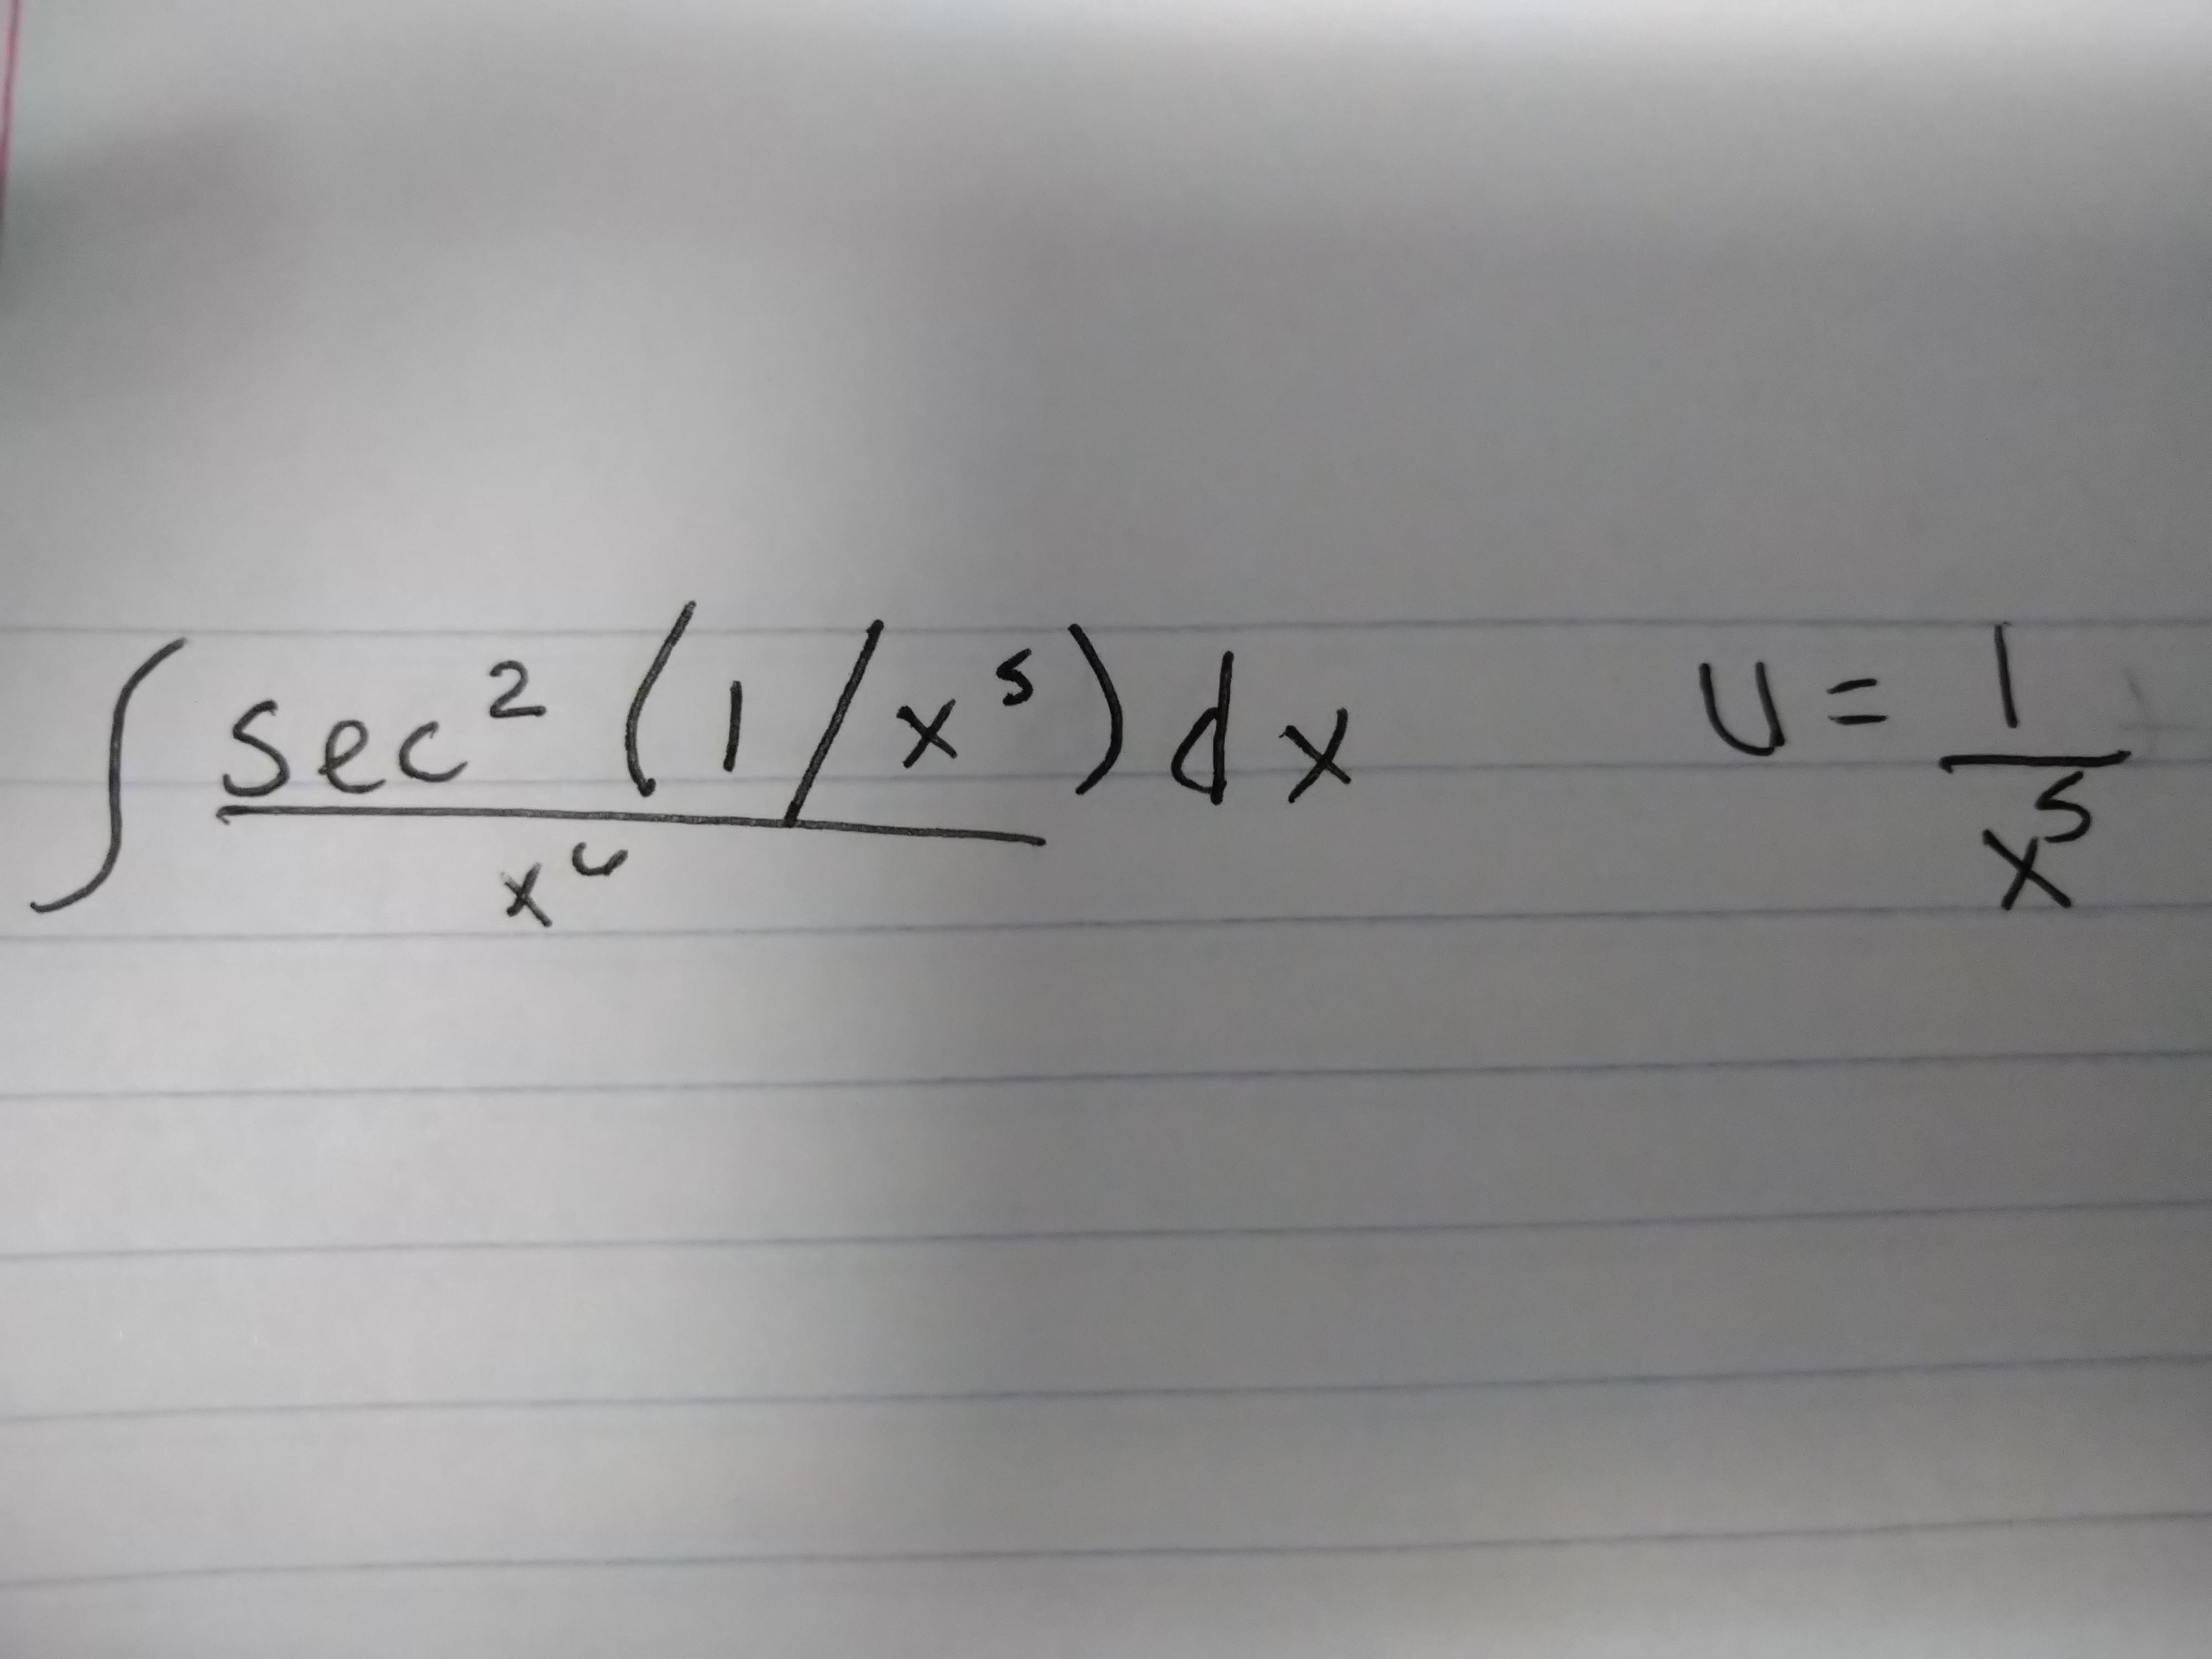 sec (1/x)d 2 S X X